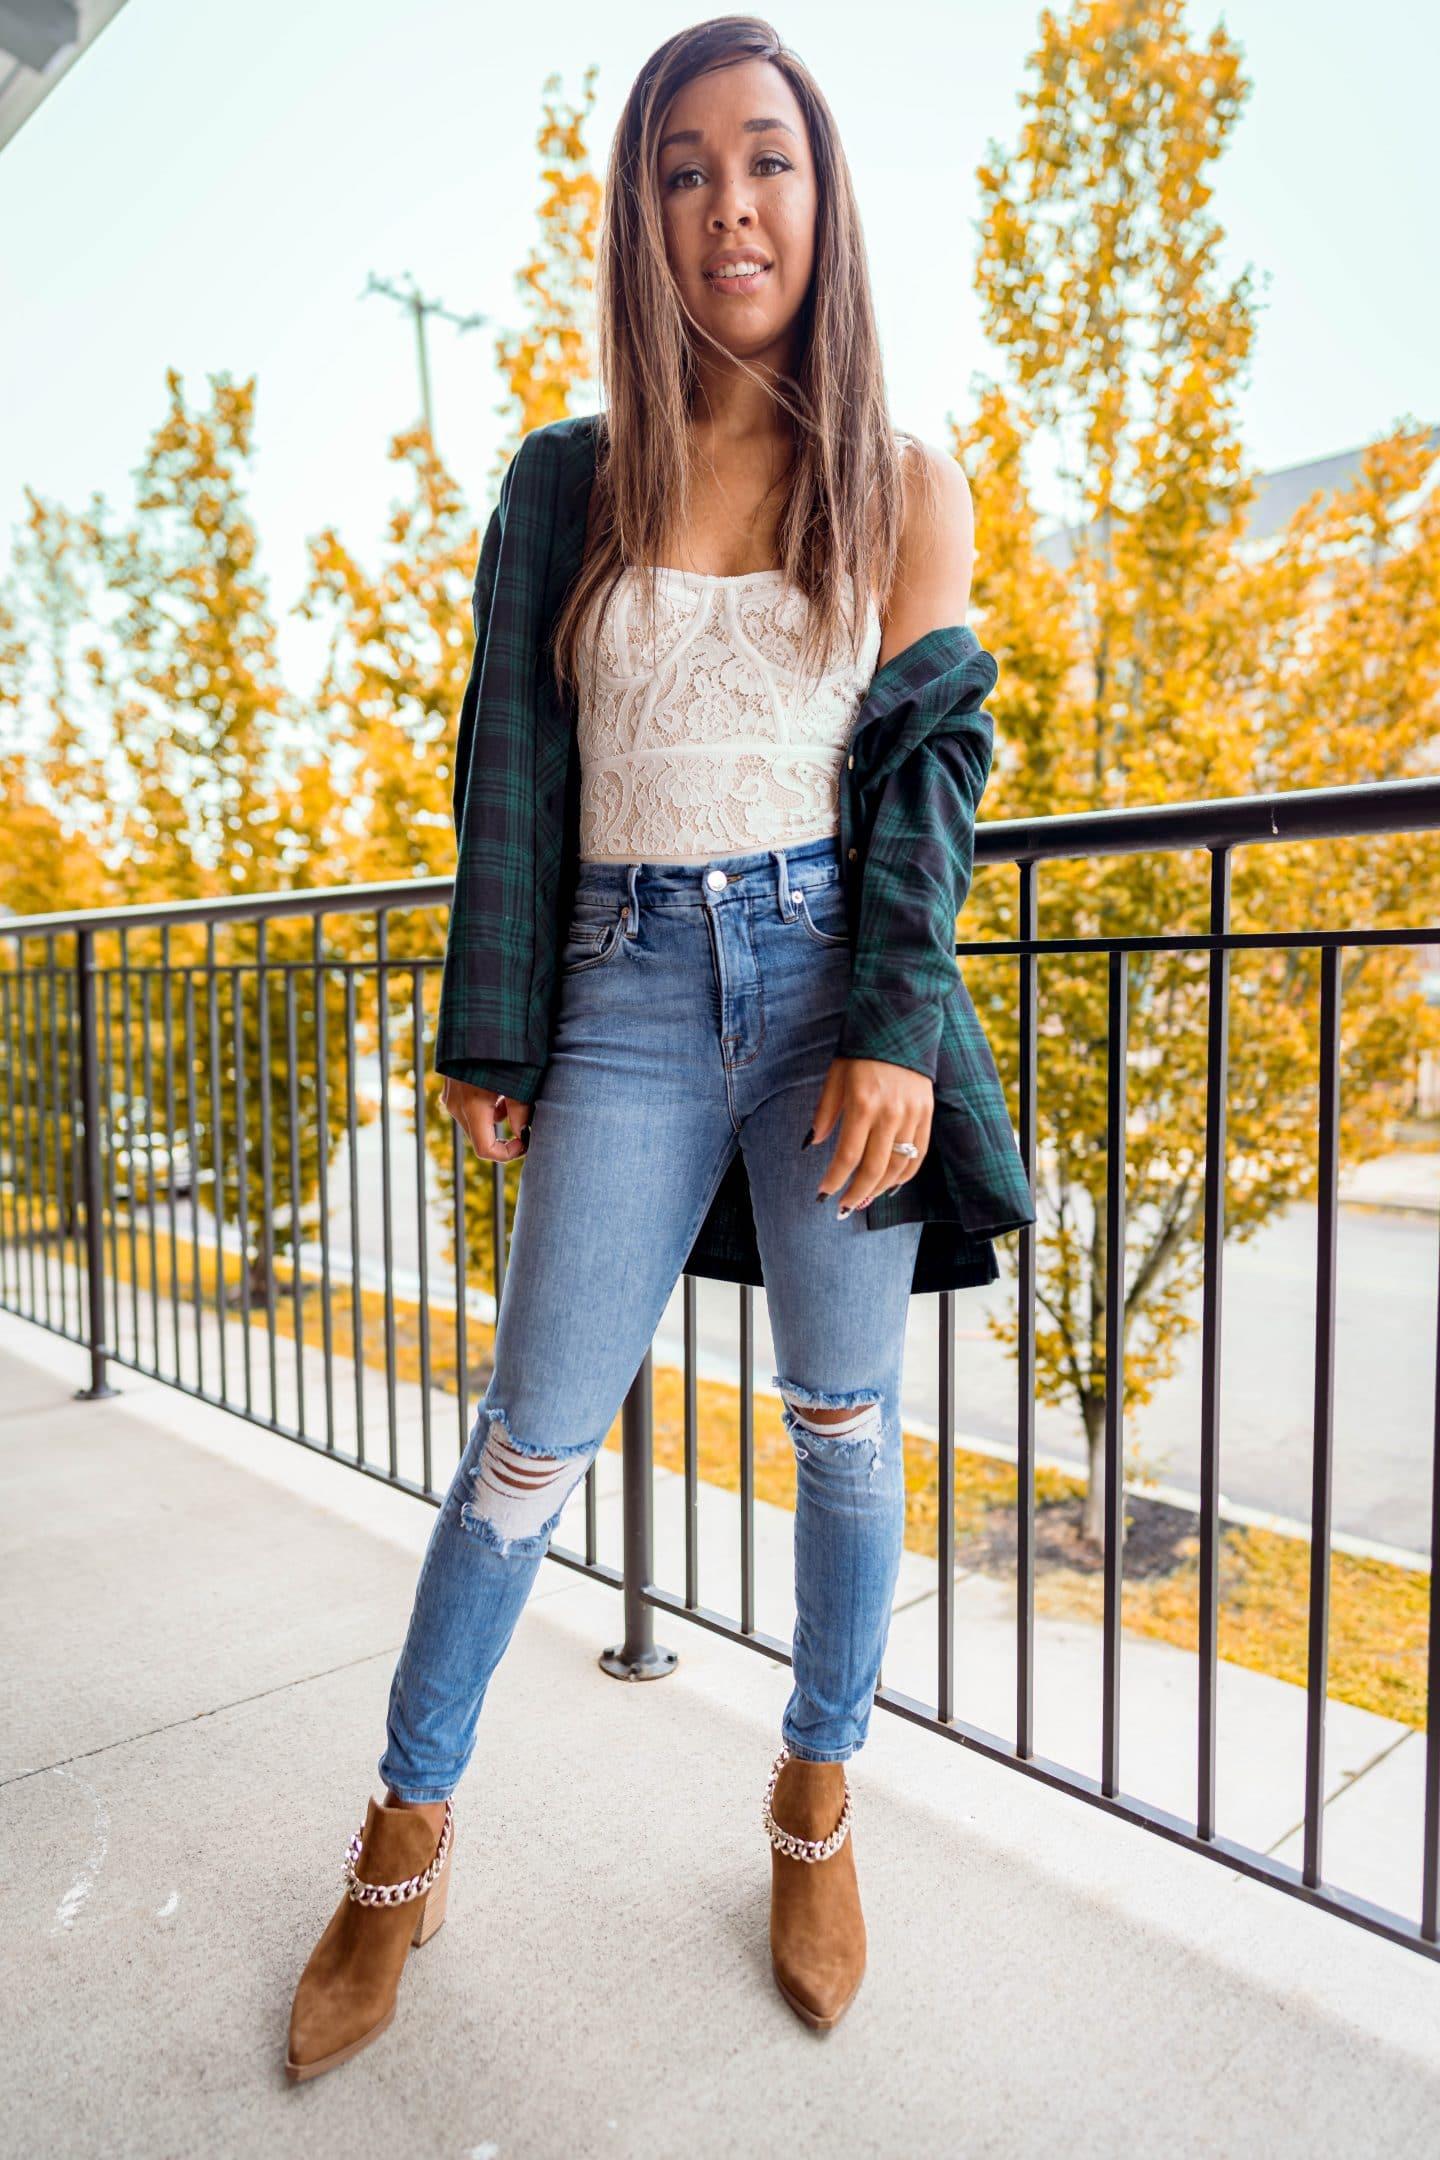 livinglesh oversized flannel top